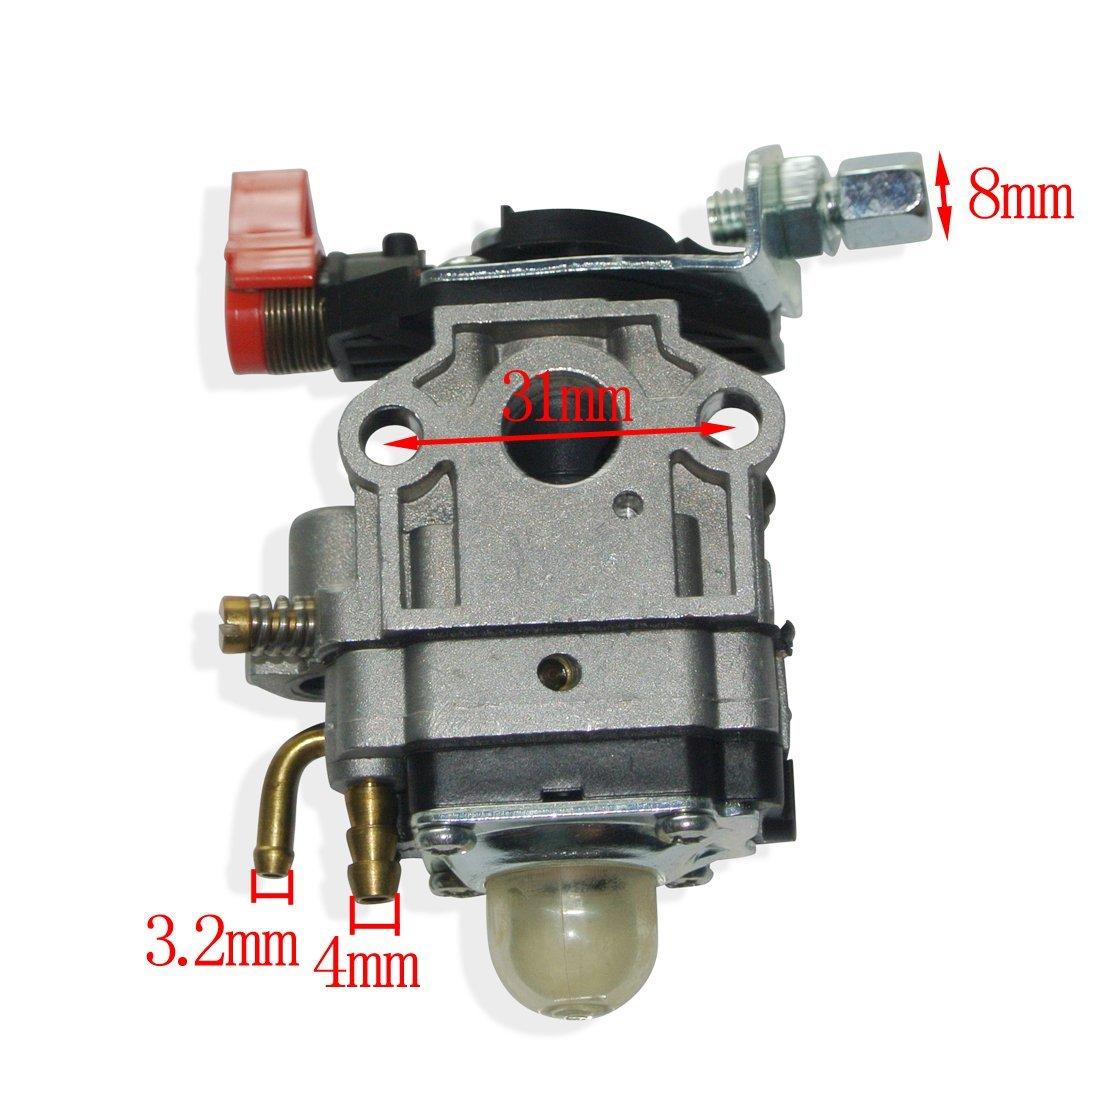 JRL Carby Carburetor Fit 24cc 25cc 26cc 1E34F Engine Motor Part Trimmer Bushcutter Huang Machinery